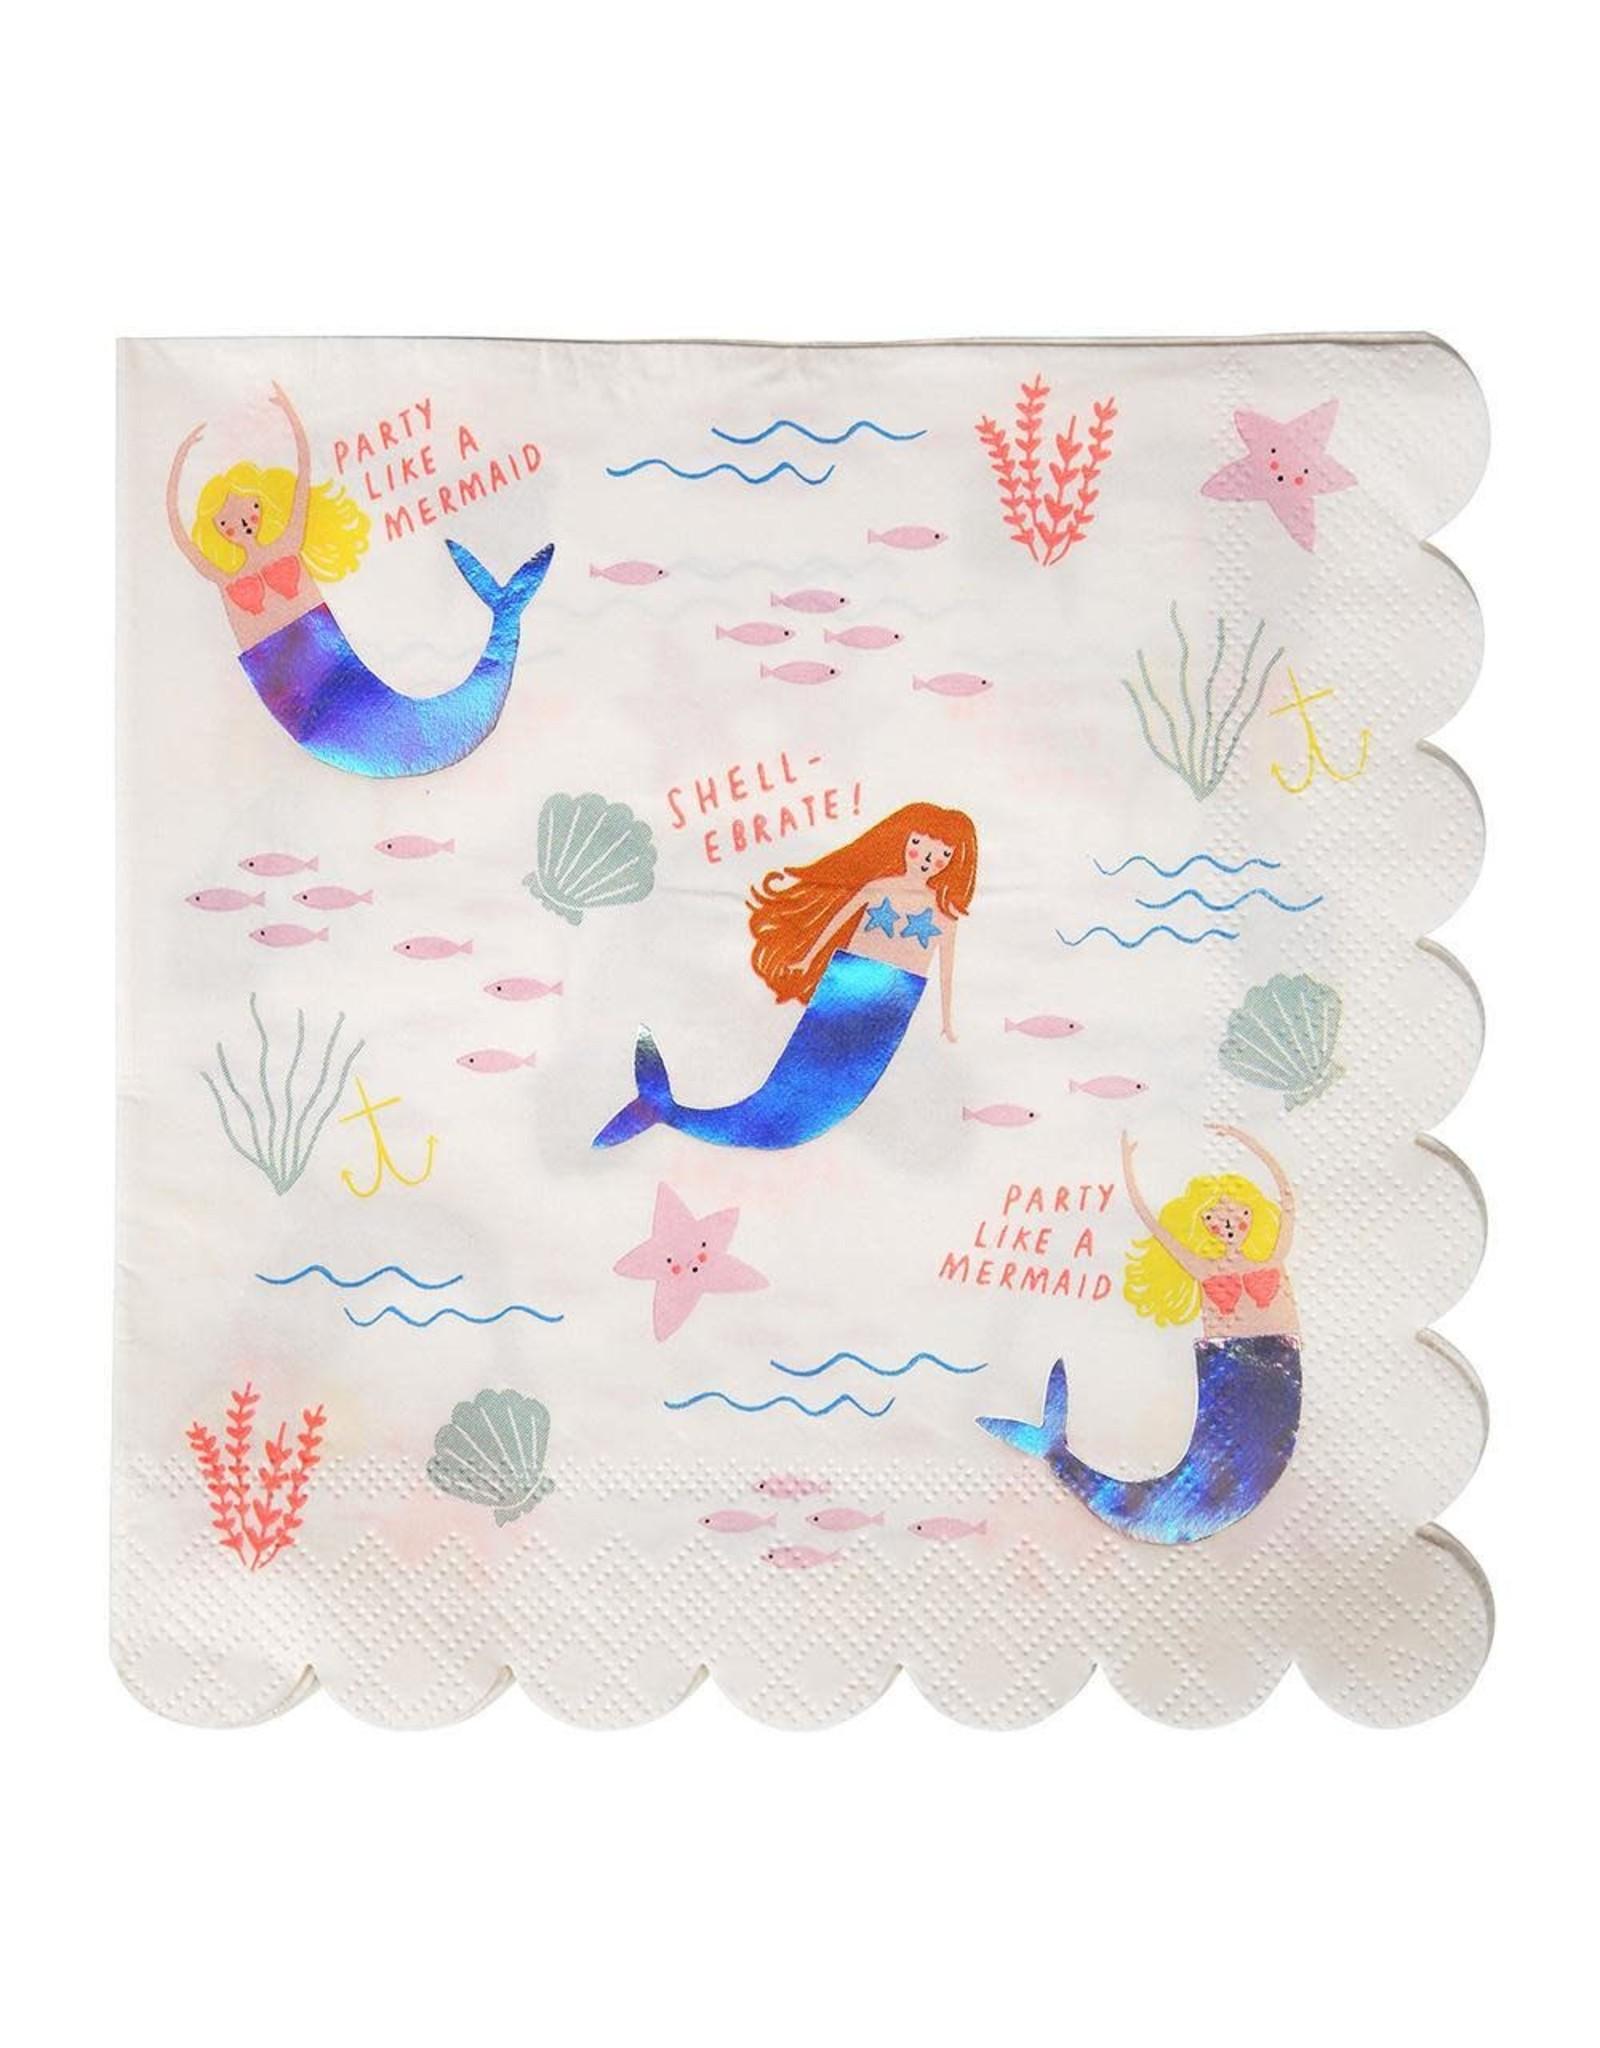 Meri Meri Serviettes | Zeemeermin | 16st | 13 x 13 cm